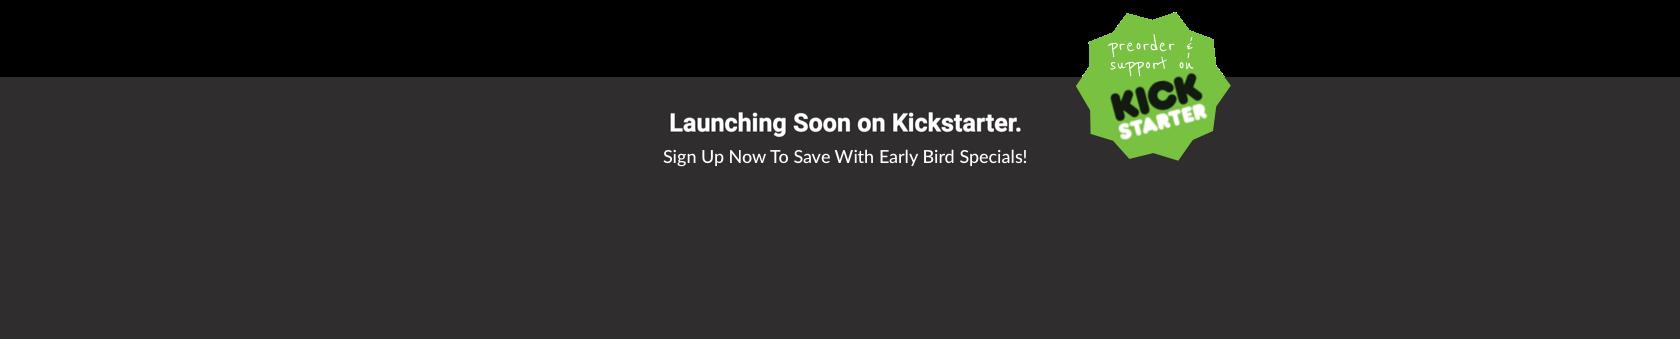 black kickstarter.png